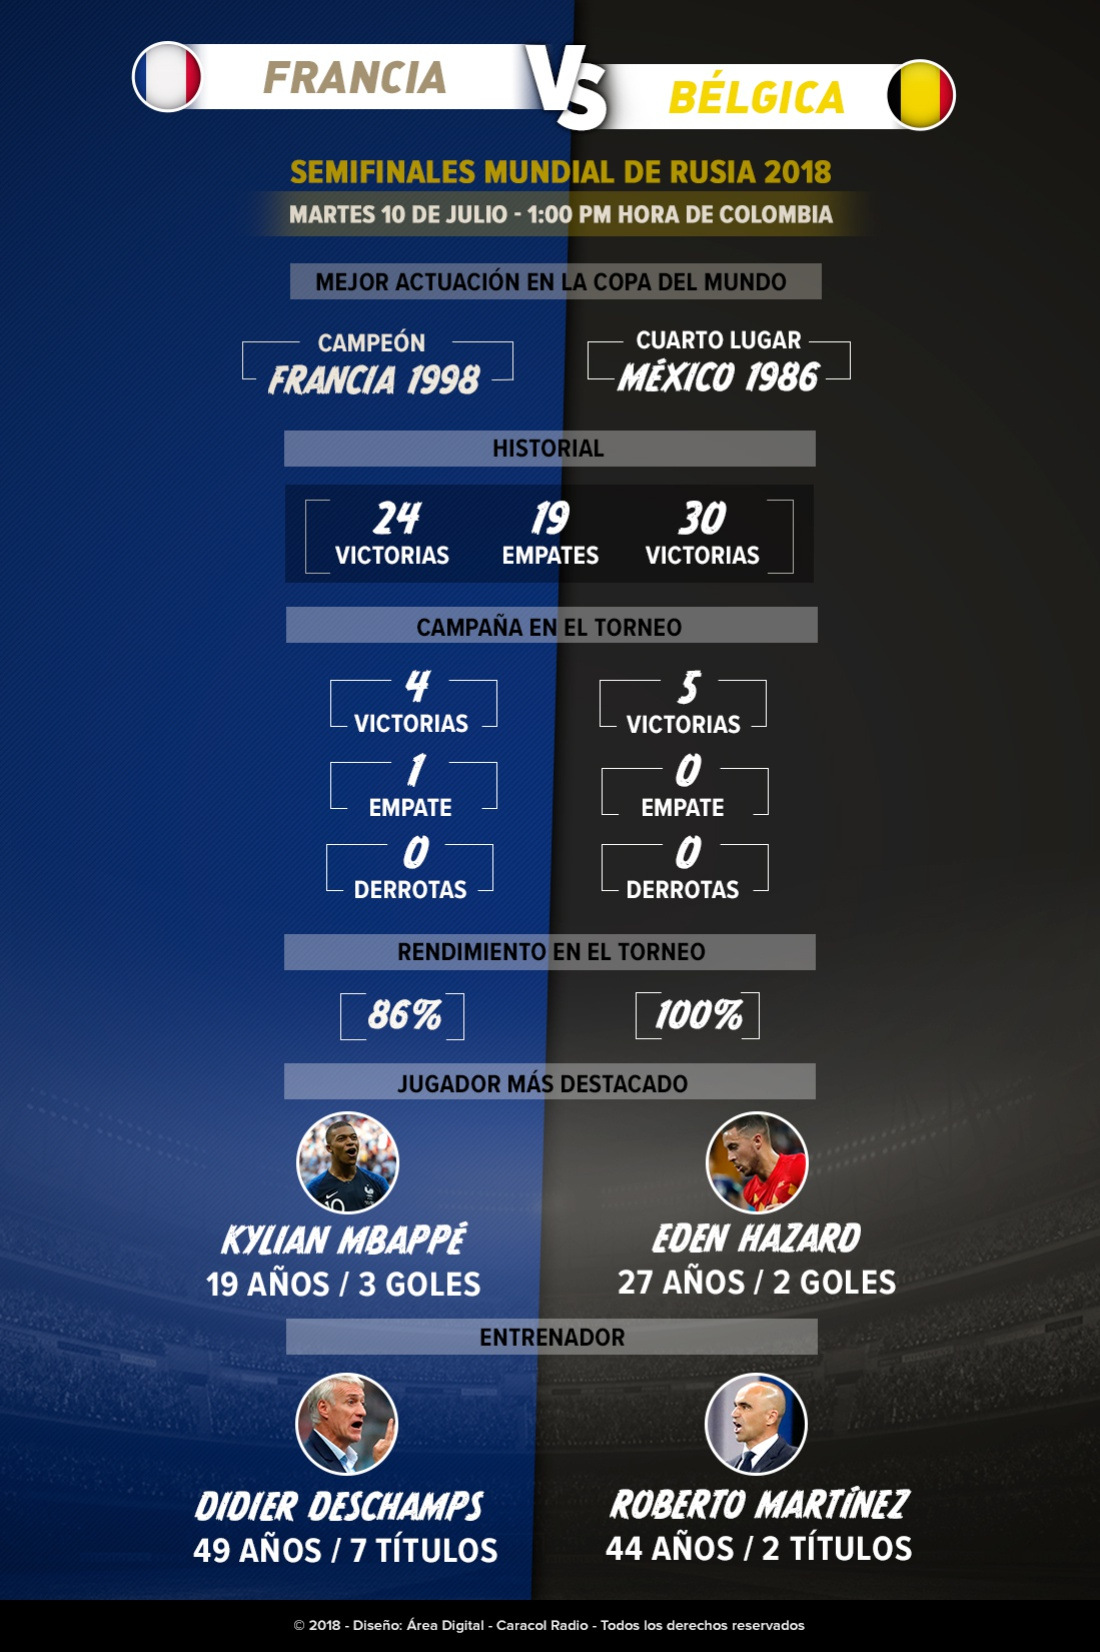 francia beñgica on line: Mano a mano: Francia - Bélgica, dos favoritos al título